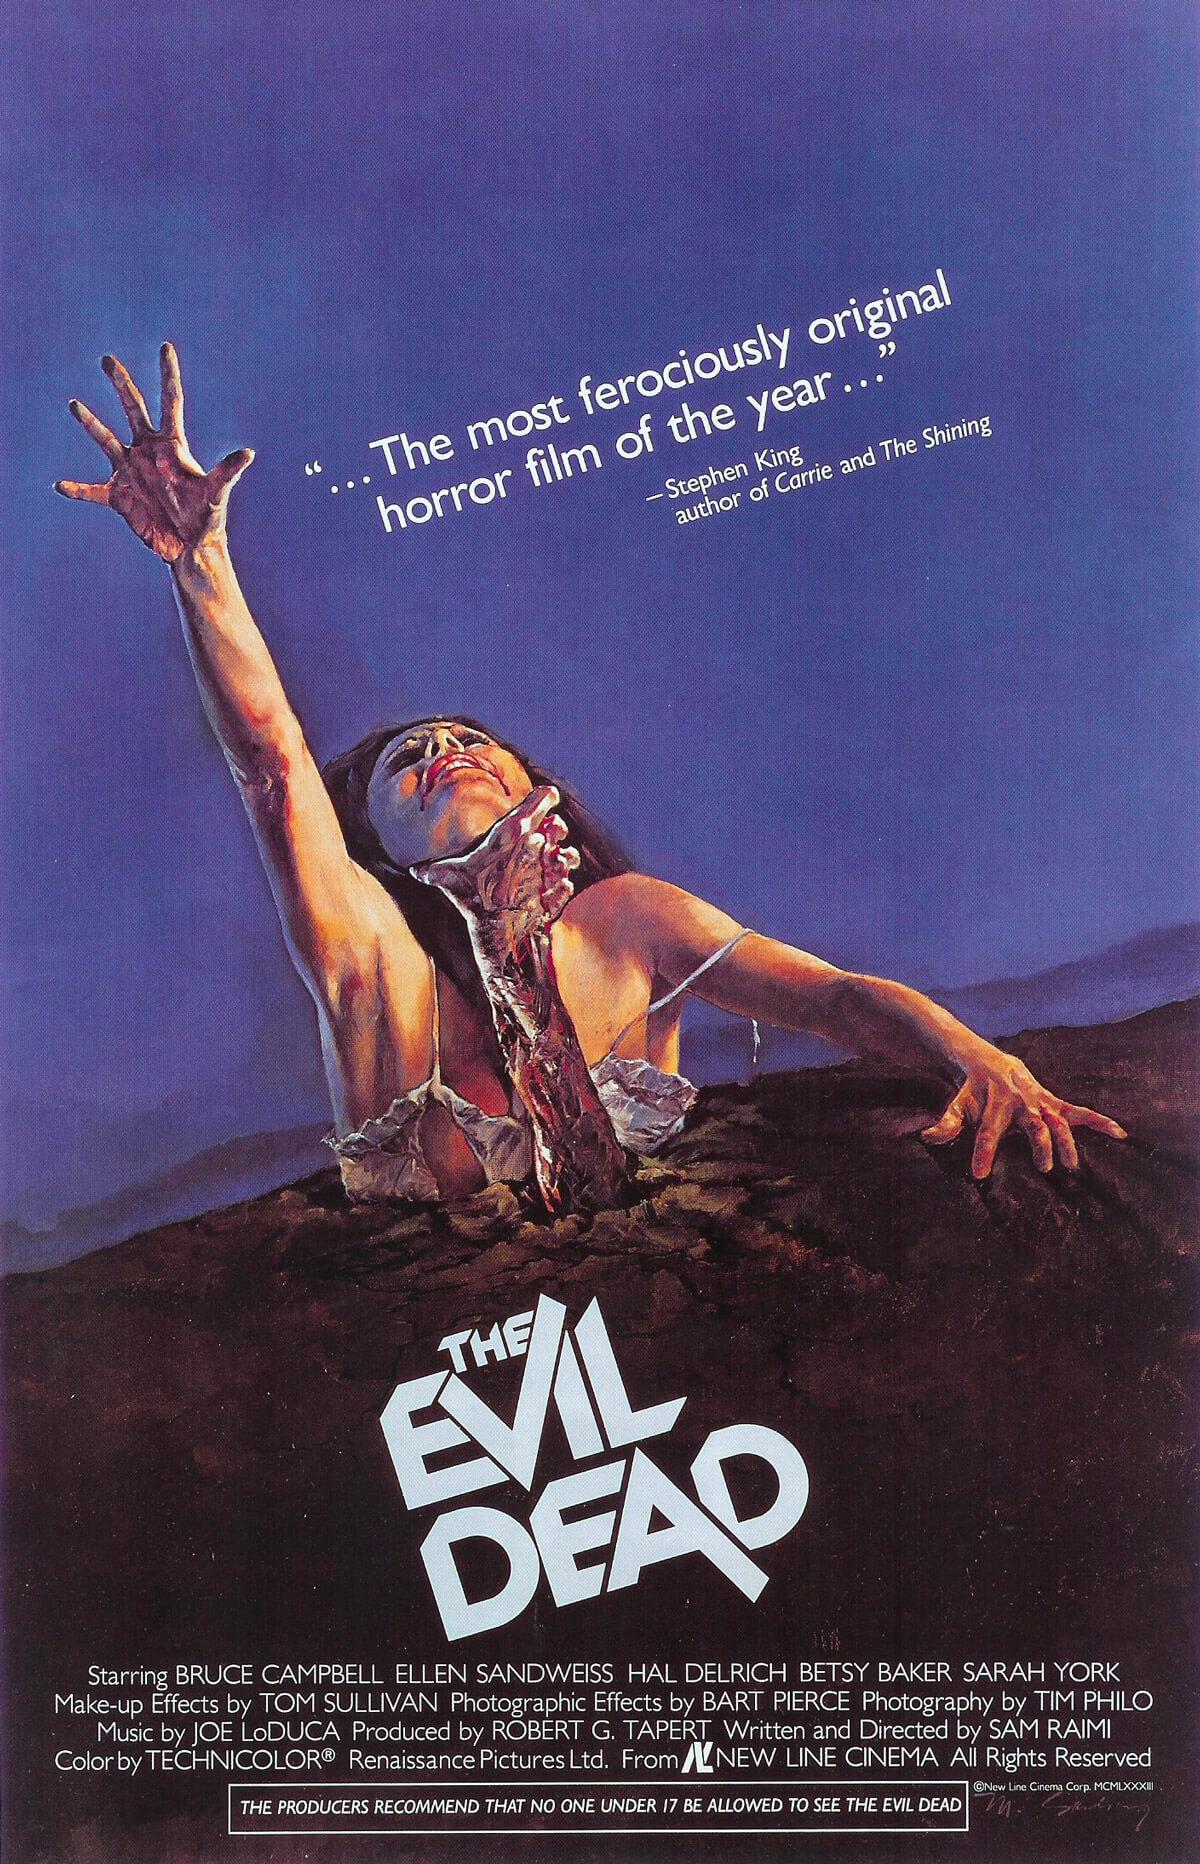 Morbo - The Evil Dead